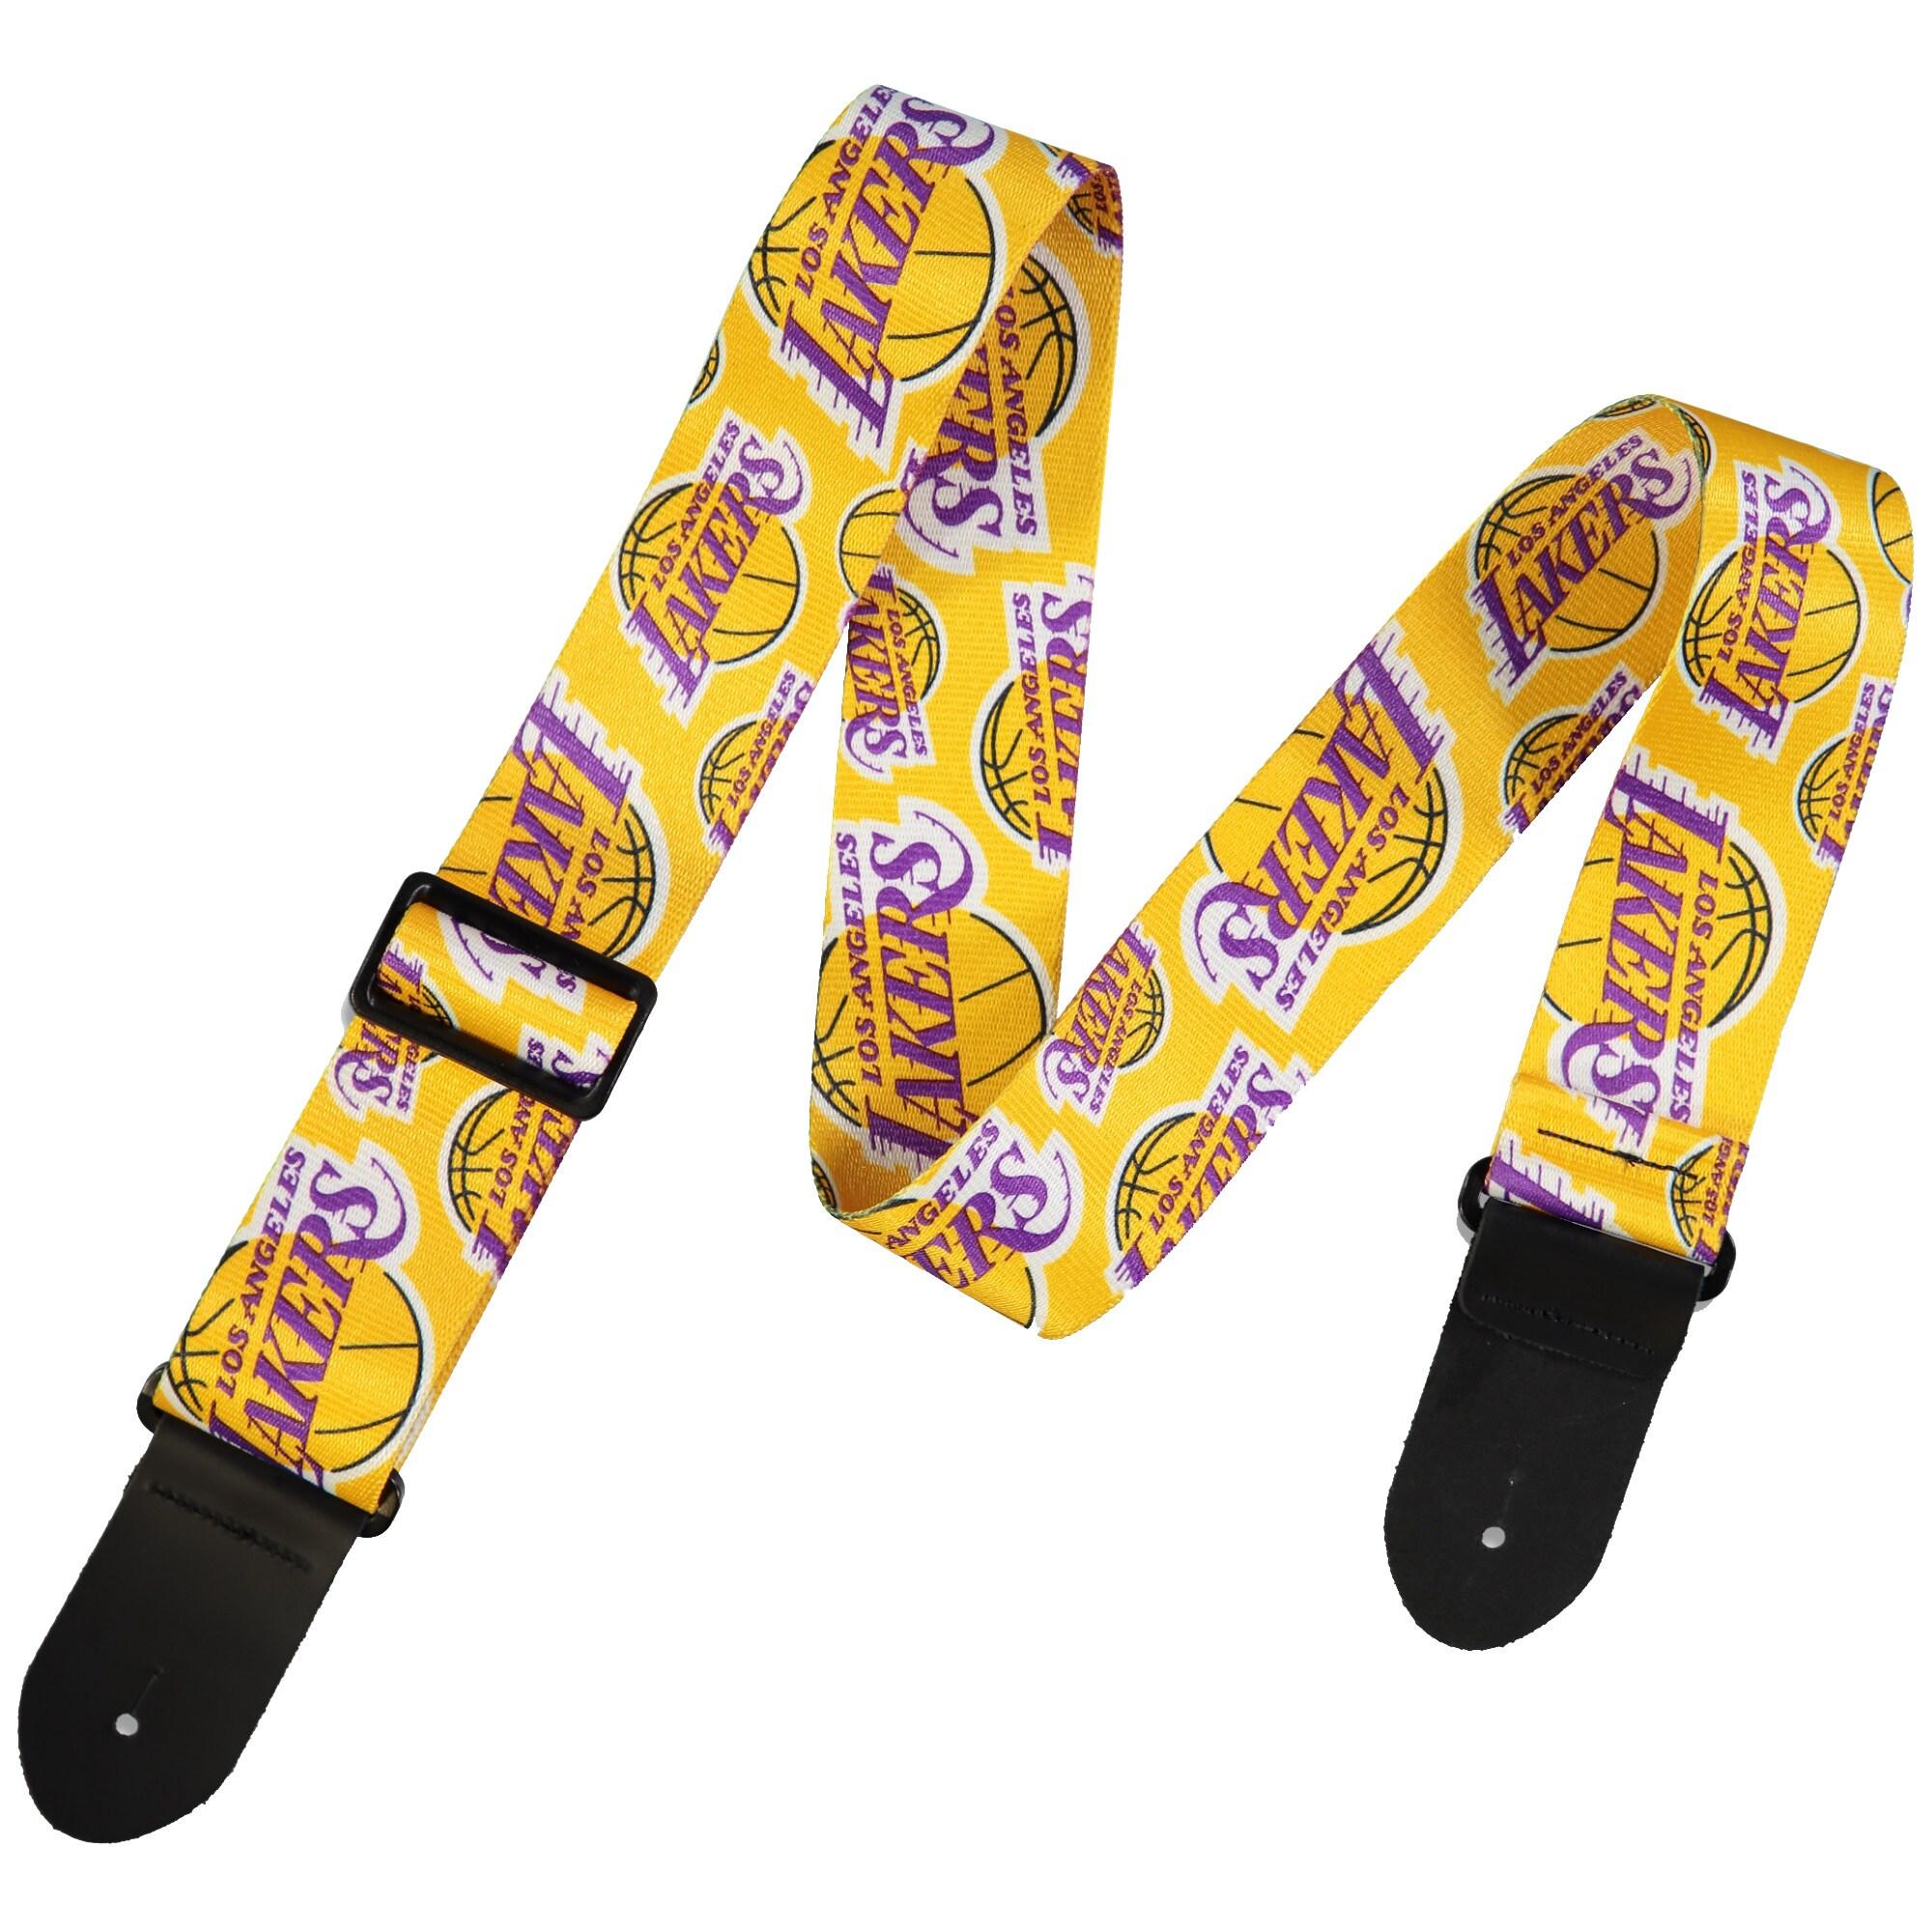 Los Angeles Lakers Woodrow Guitar Guitar Strap